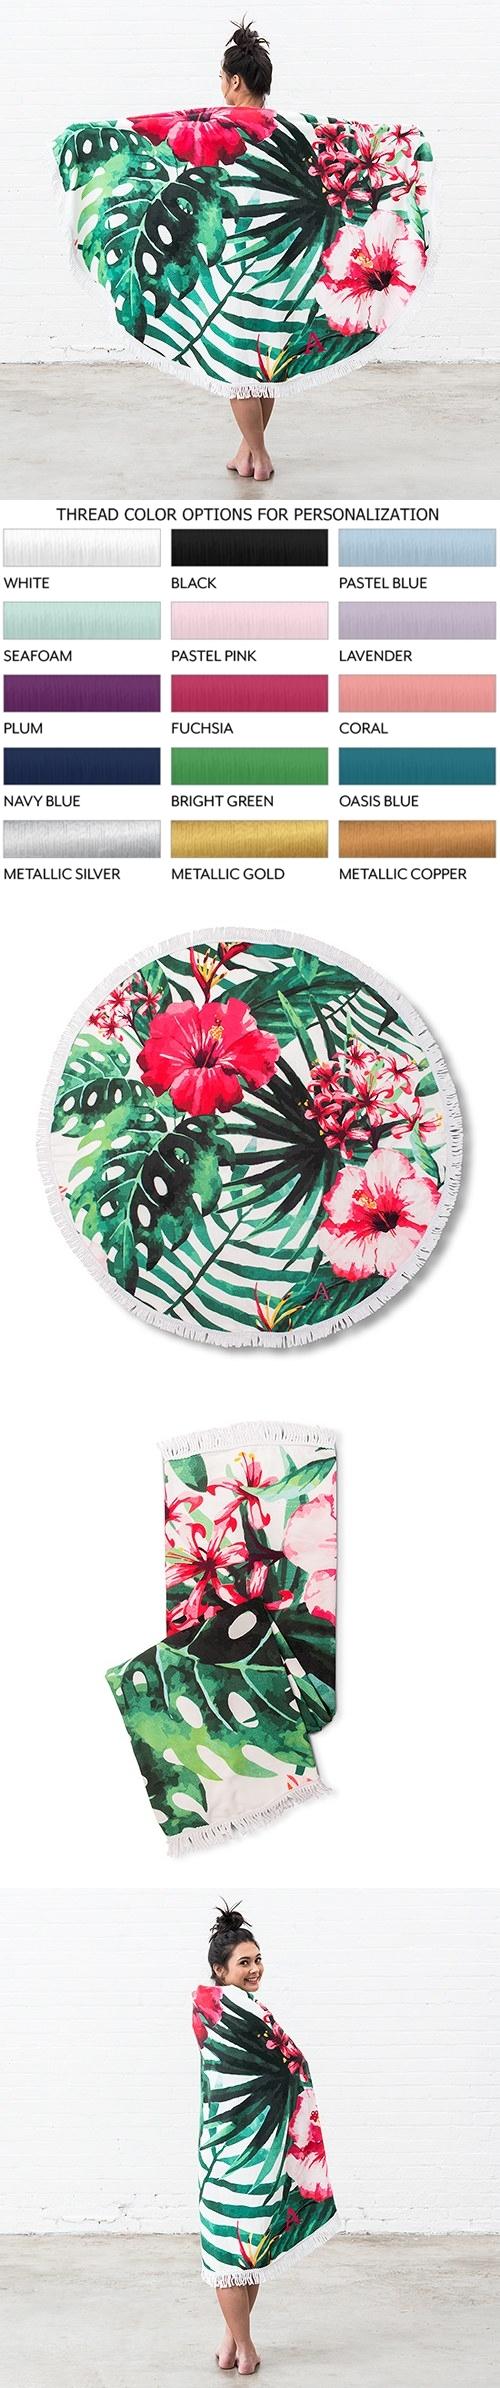 Weddingstar Personalizable Tropical Hibiscus Motif Round Beach Towel